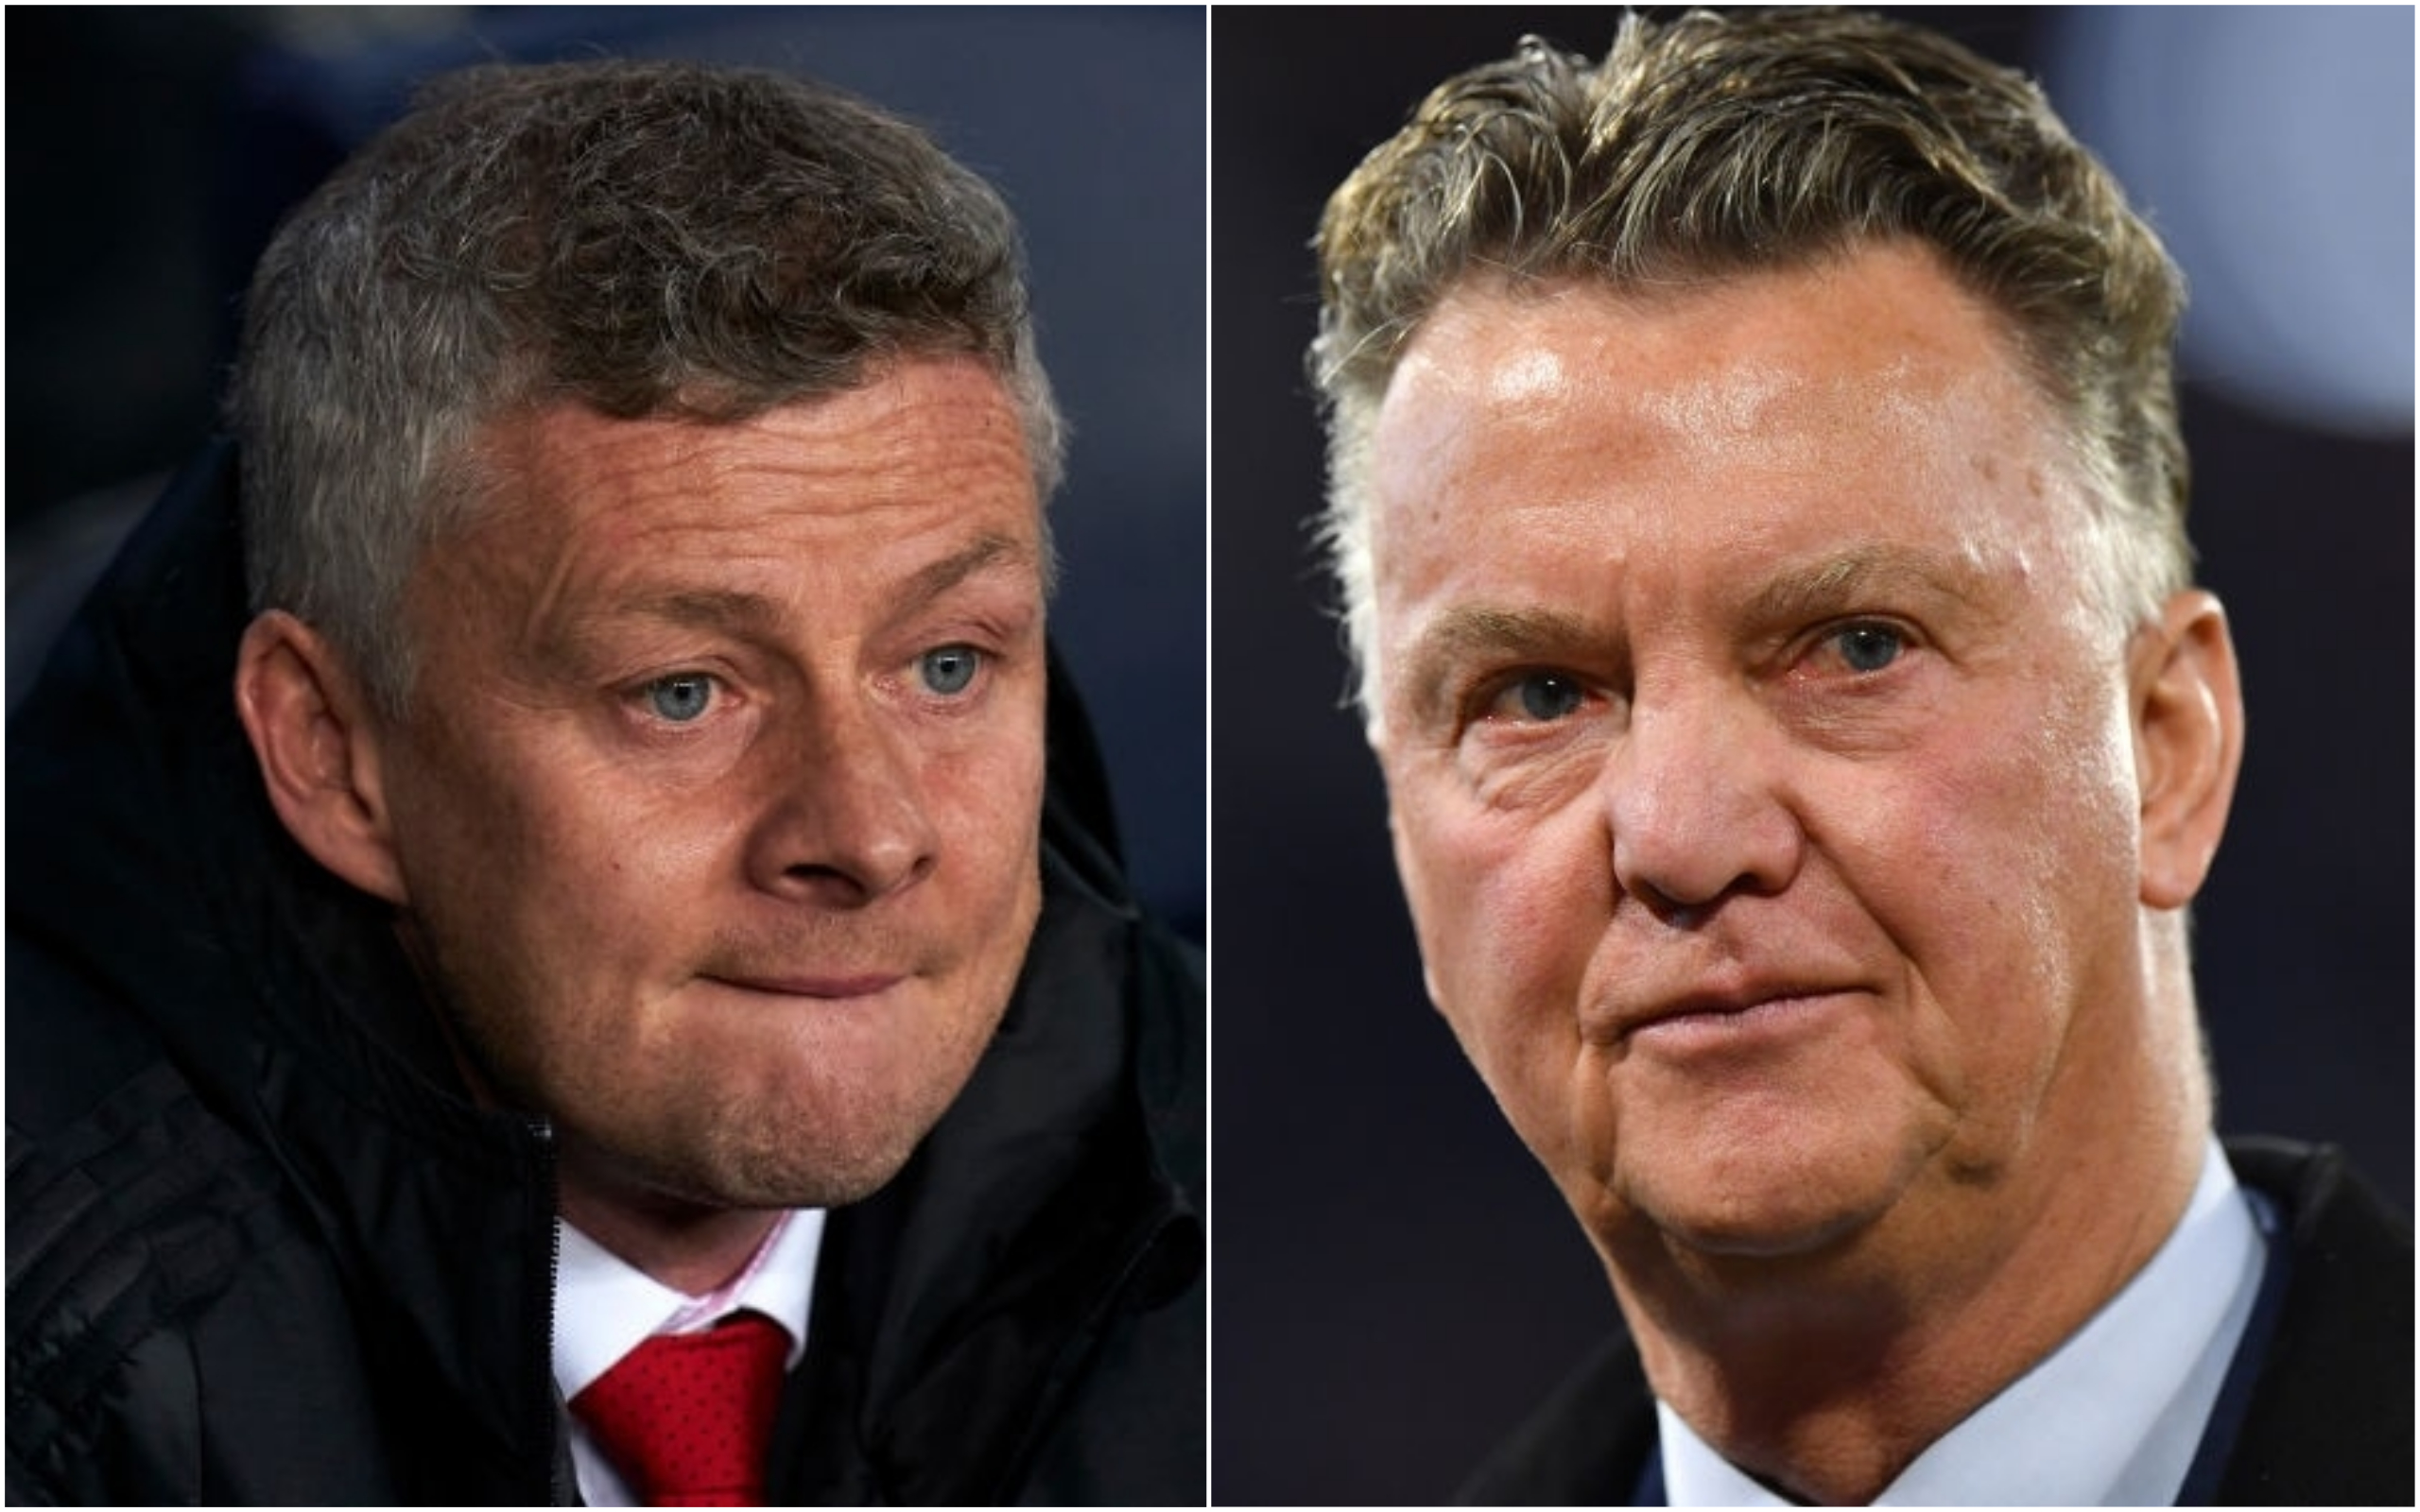 Louis van Gaal slams Ole Gunnar Solskjaer tactics after Manchester United's defeat to Barcelona